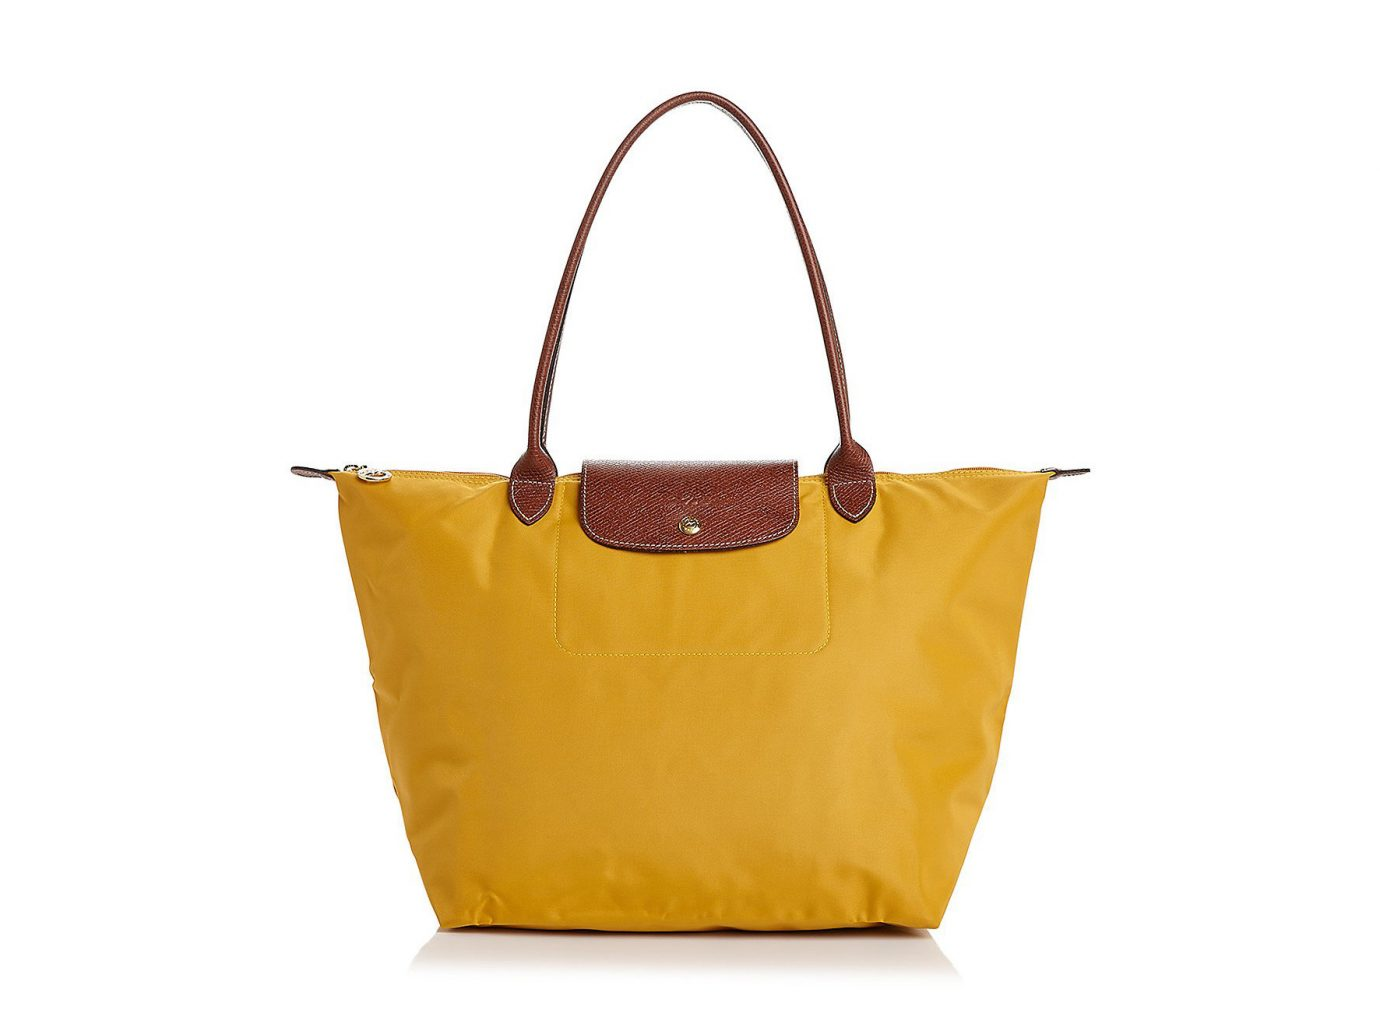 Style + Design handbag yellow bag shoulder bag fashion accessory brown leather product tote bag accessory beige product design brand caramel color